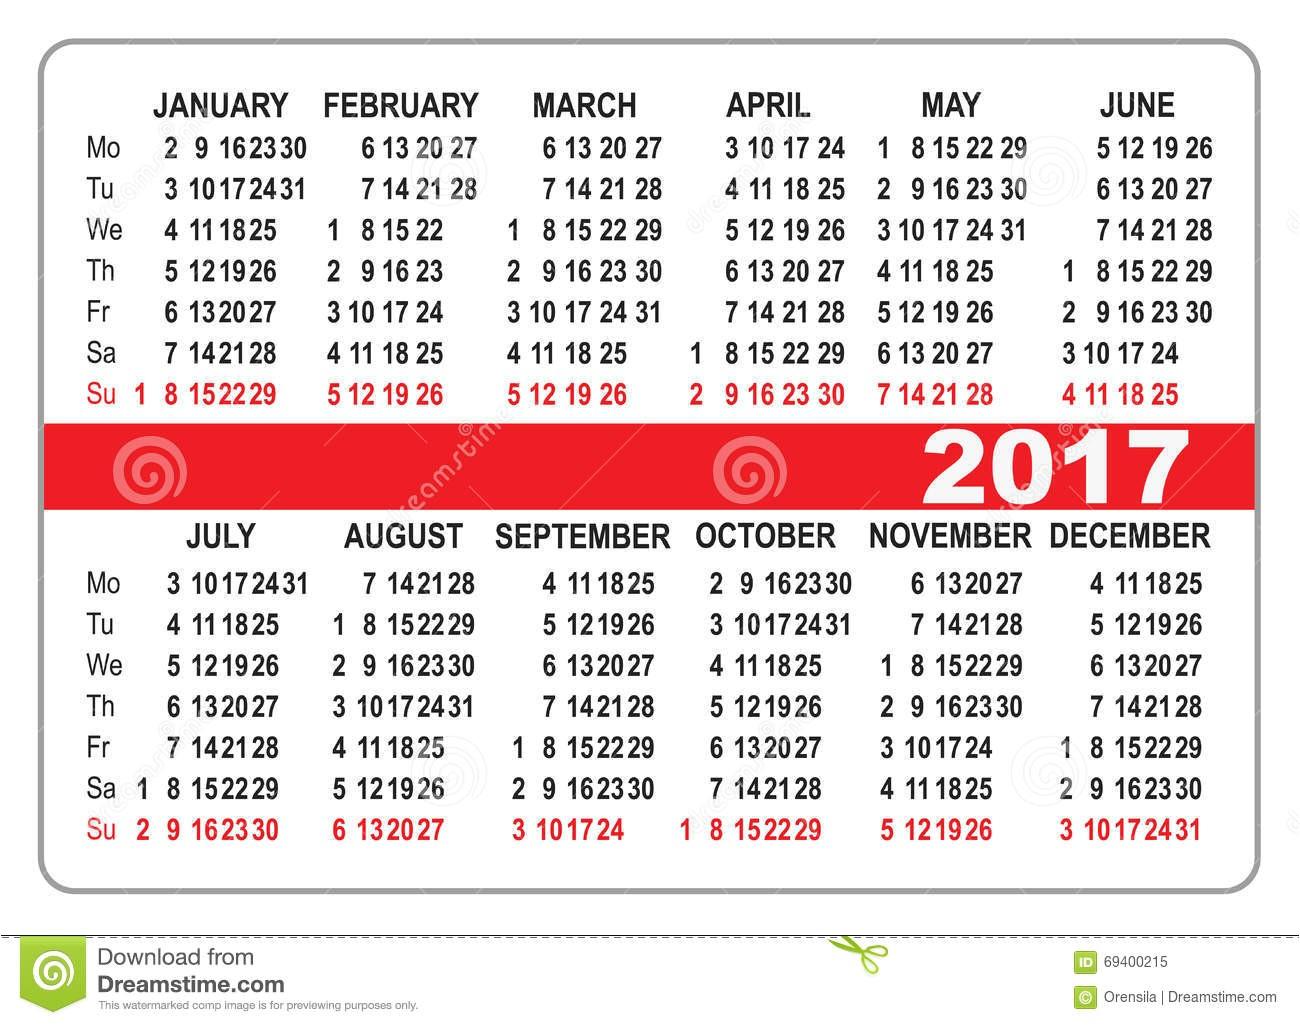 2017 pocket calendar 1687